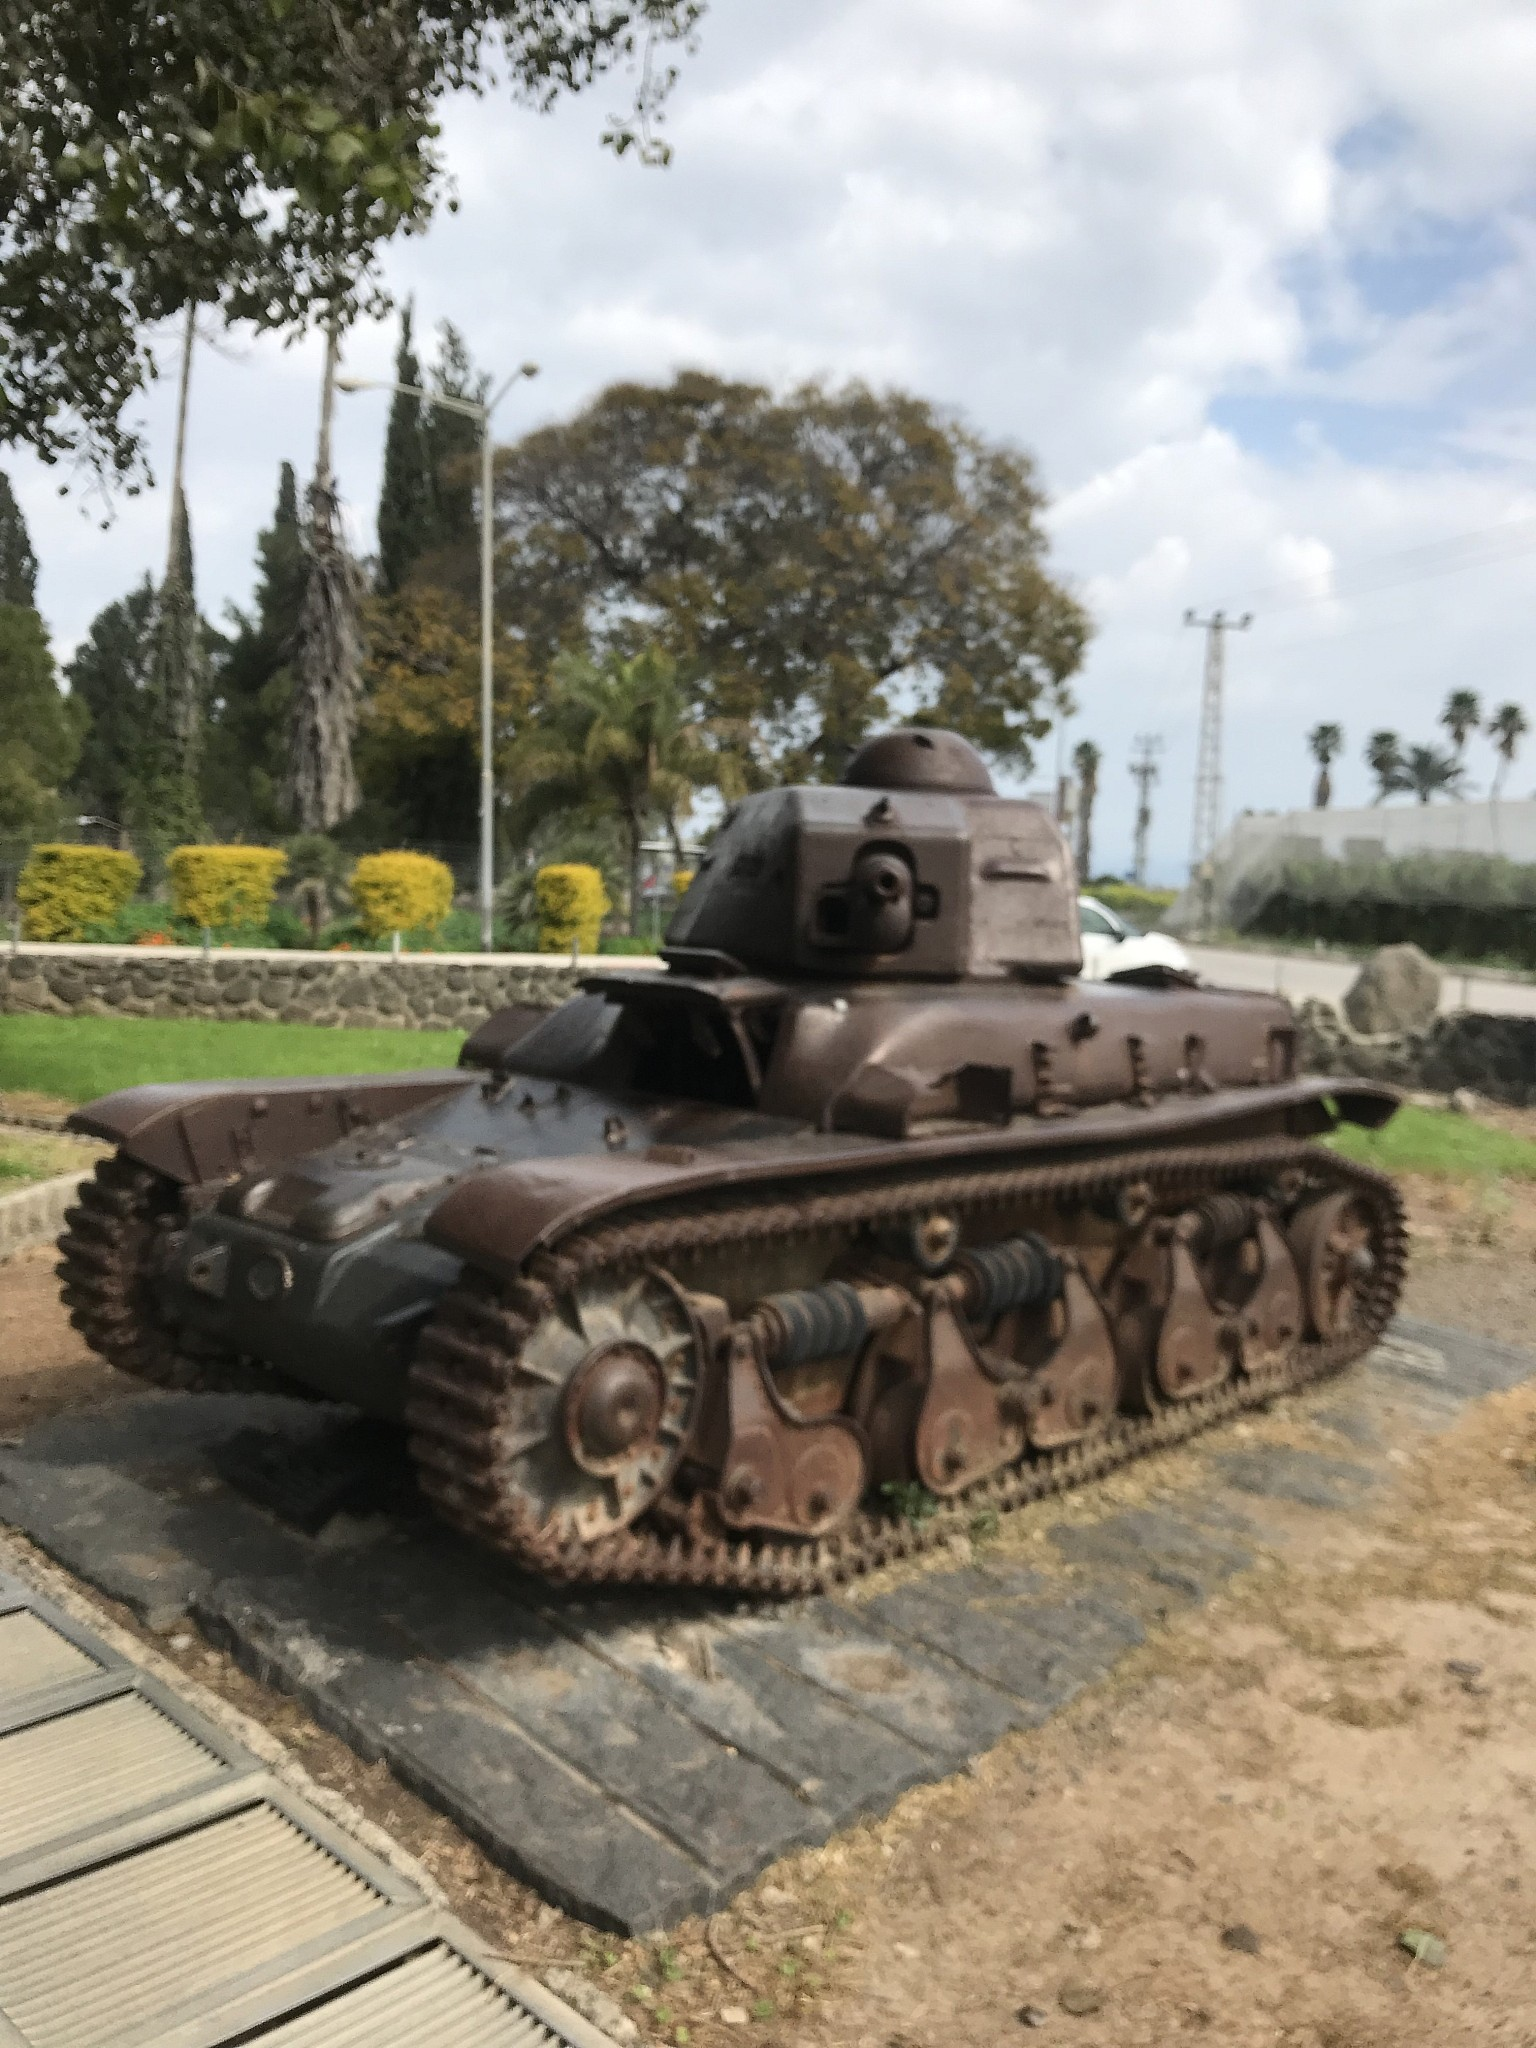 The Tank at the Gates of Degania | Bill Slott | The Blogs